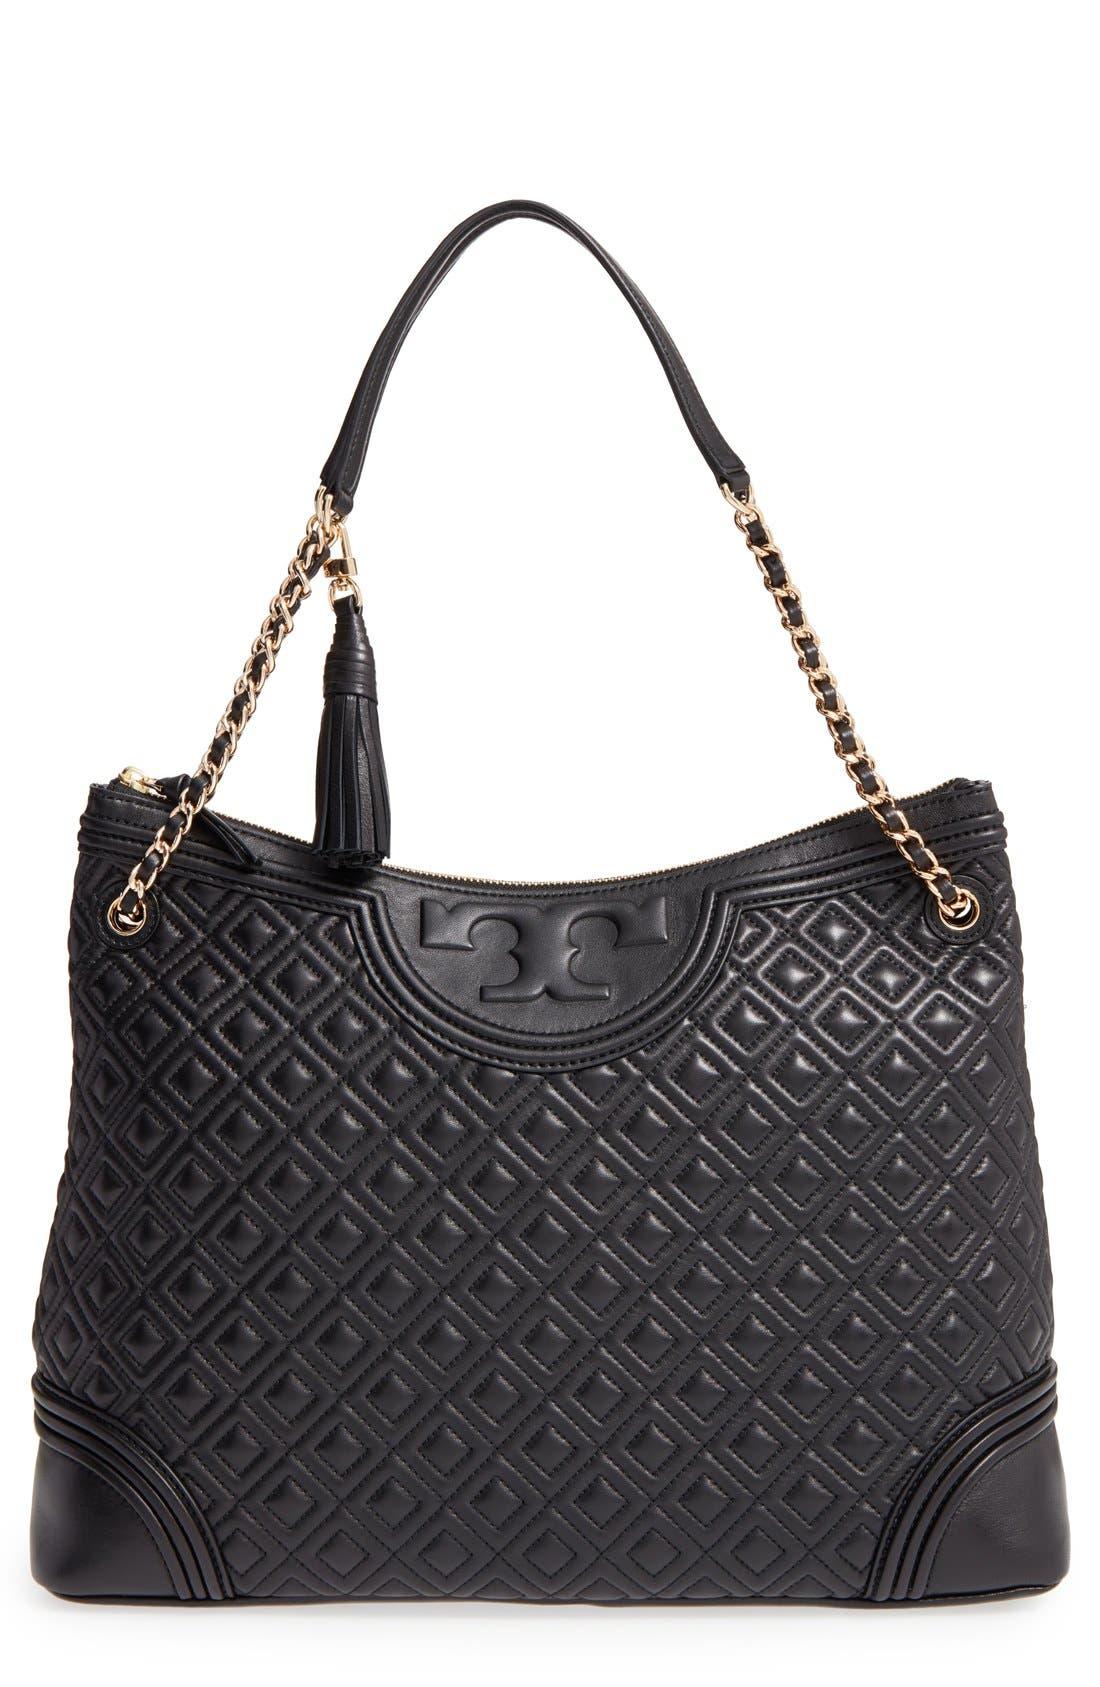 Main Image - Tory Burch 'Fleming' Leather Shoulder Bag